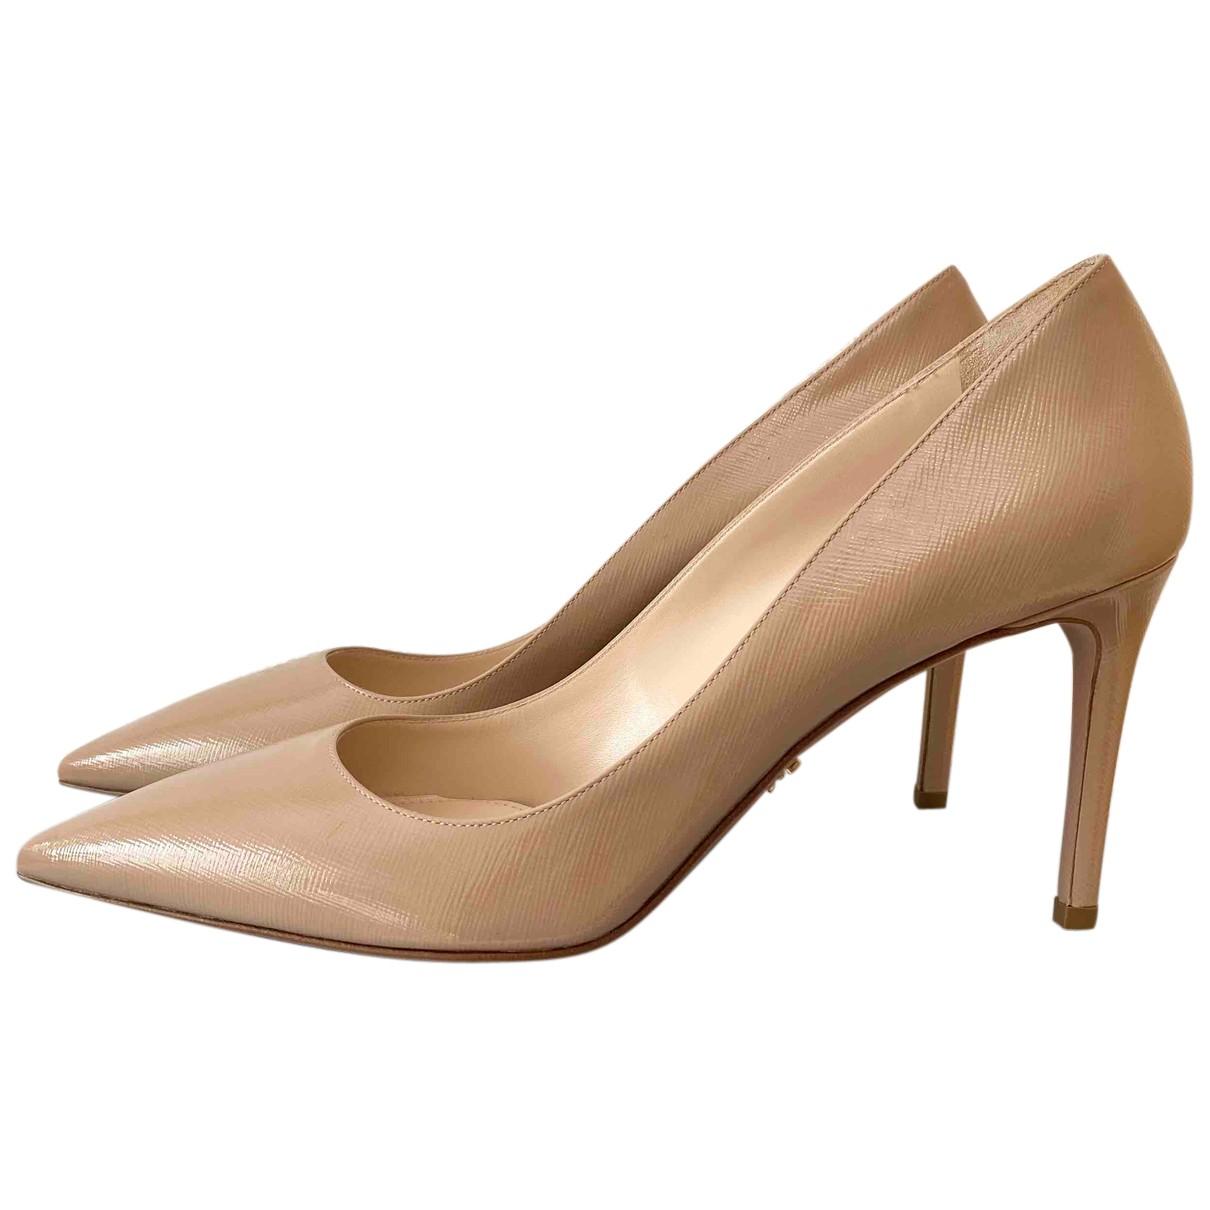 Prada N Camel Leather Heels for Women 40.5 EU